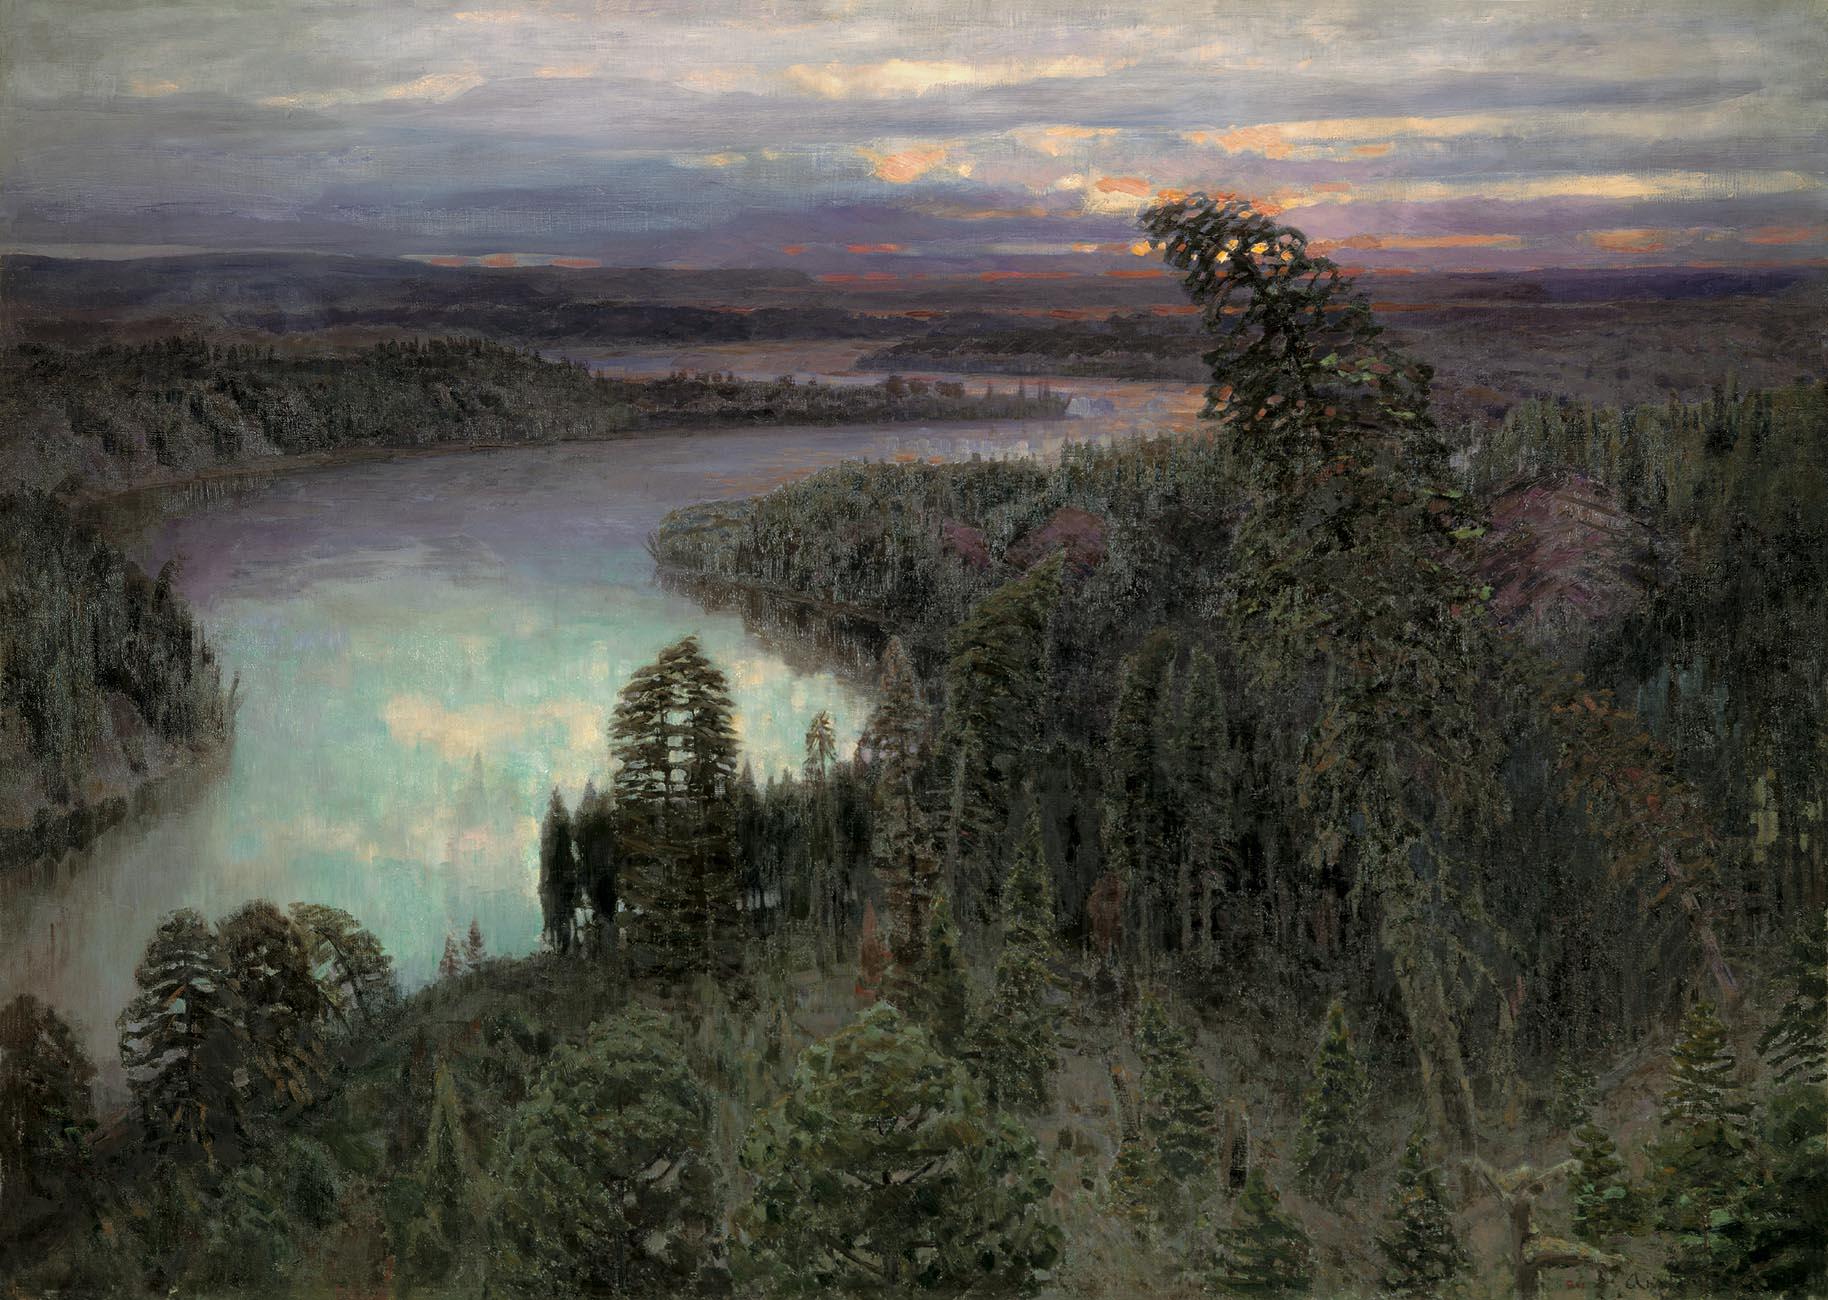 сибирская река